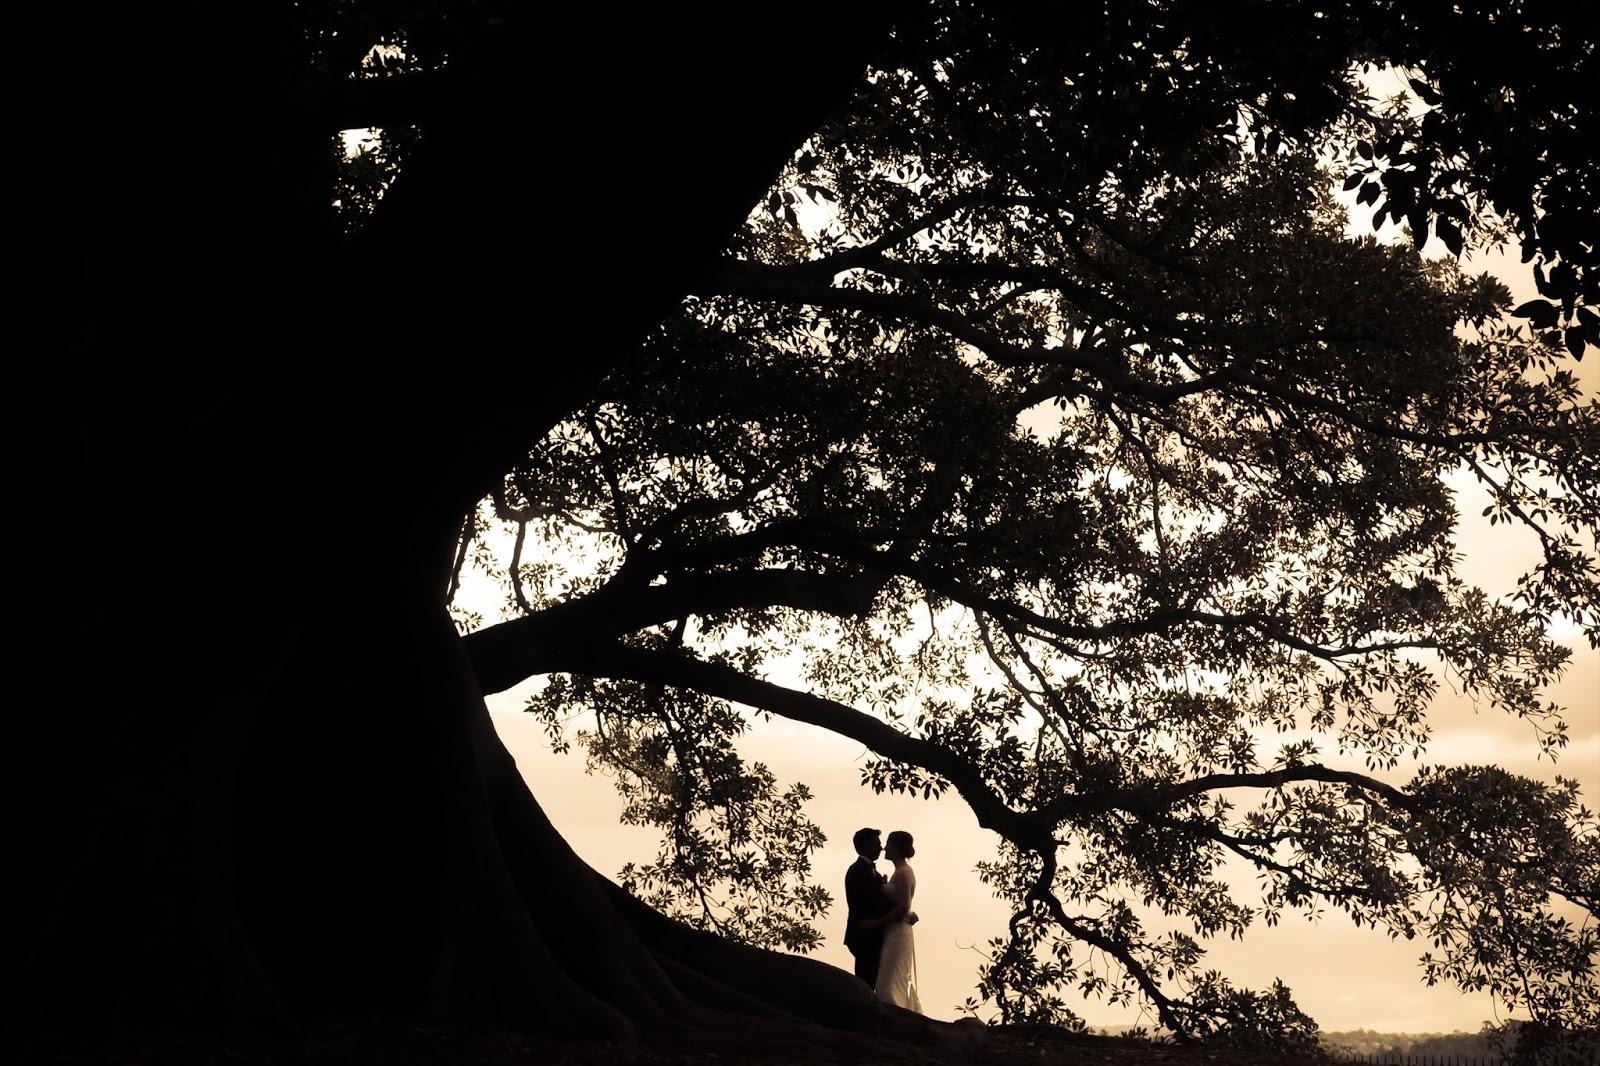 Wedding photographers in Sydney, Australia - Moving Cloud Studio